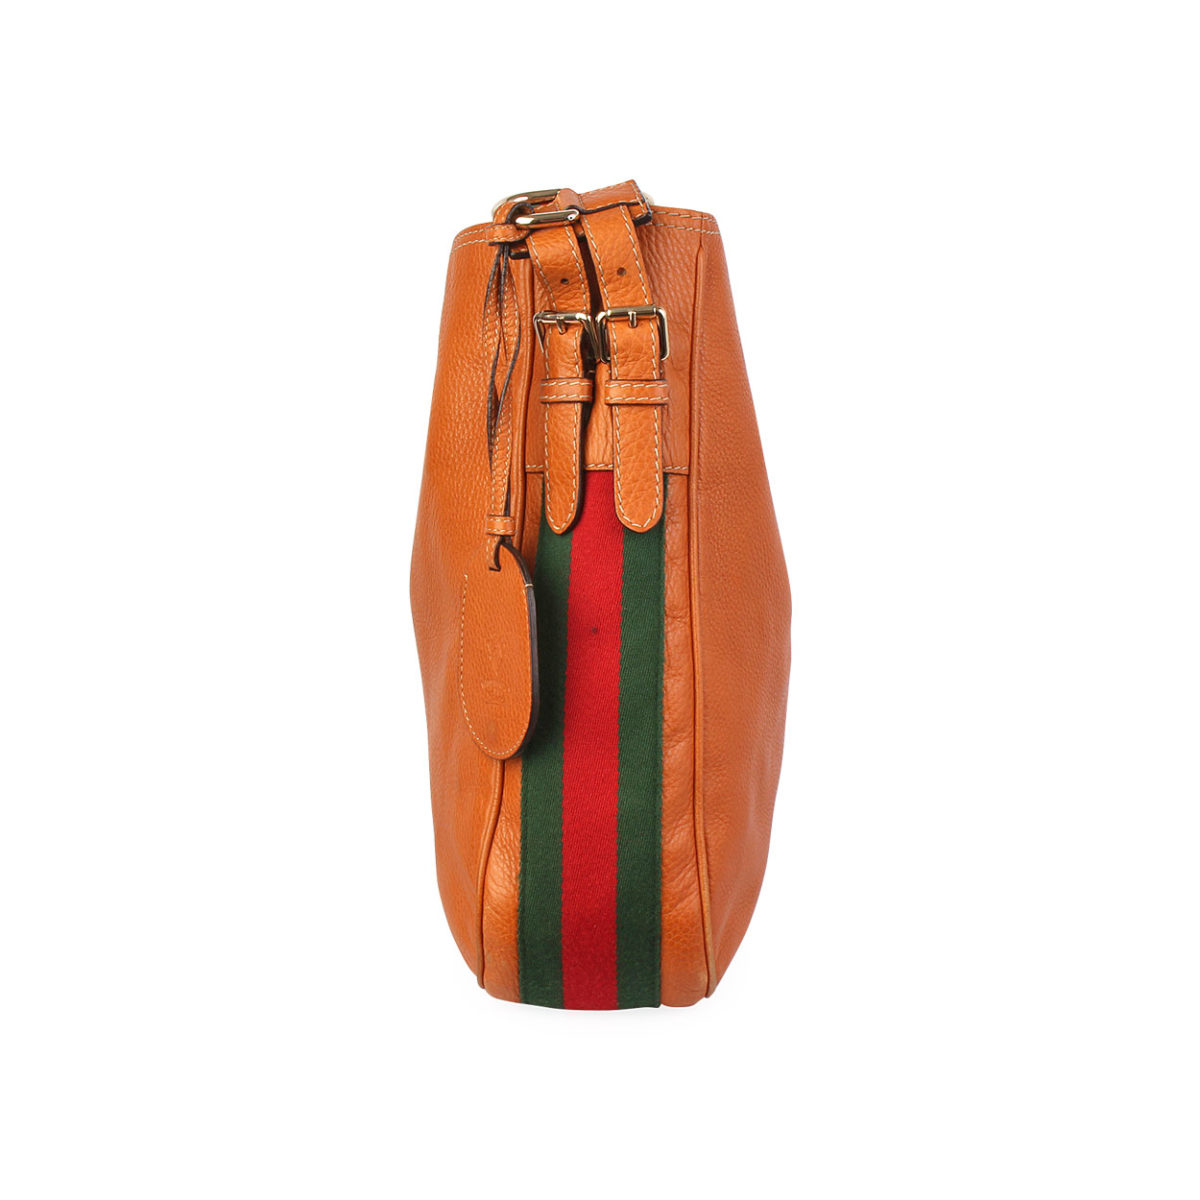 d202dfa46a8 GUCCI Leather Heritage Web Hobo Tan